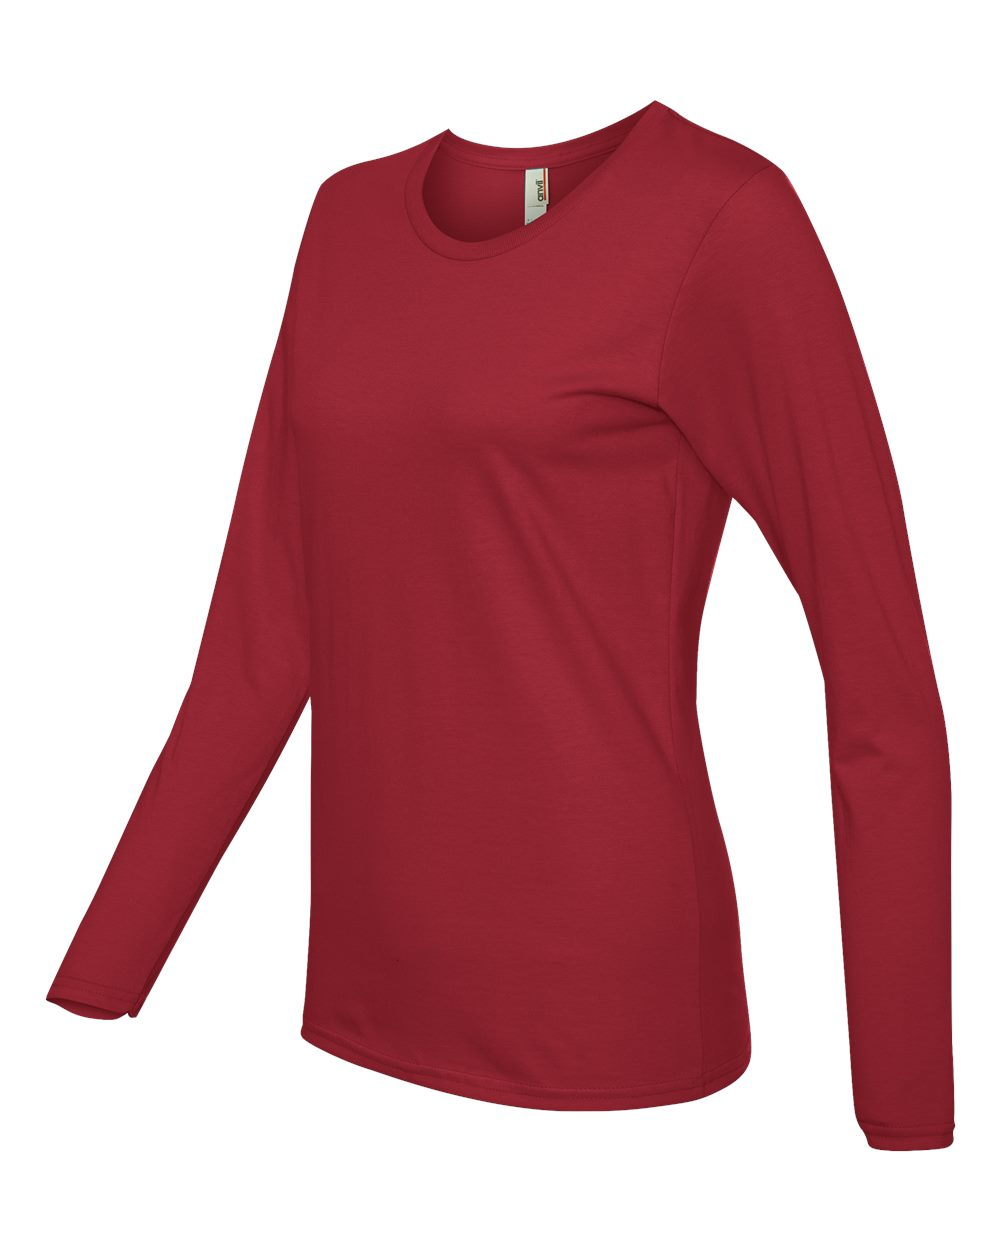 Anvil-Womens-Lightweight-Long-Sleeve-T-Shirt-884L-Size-S-2XL thumbnail 19